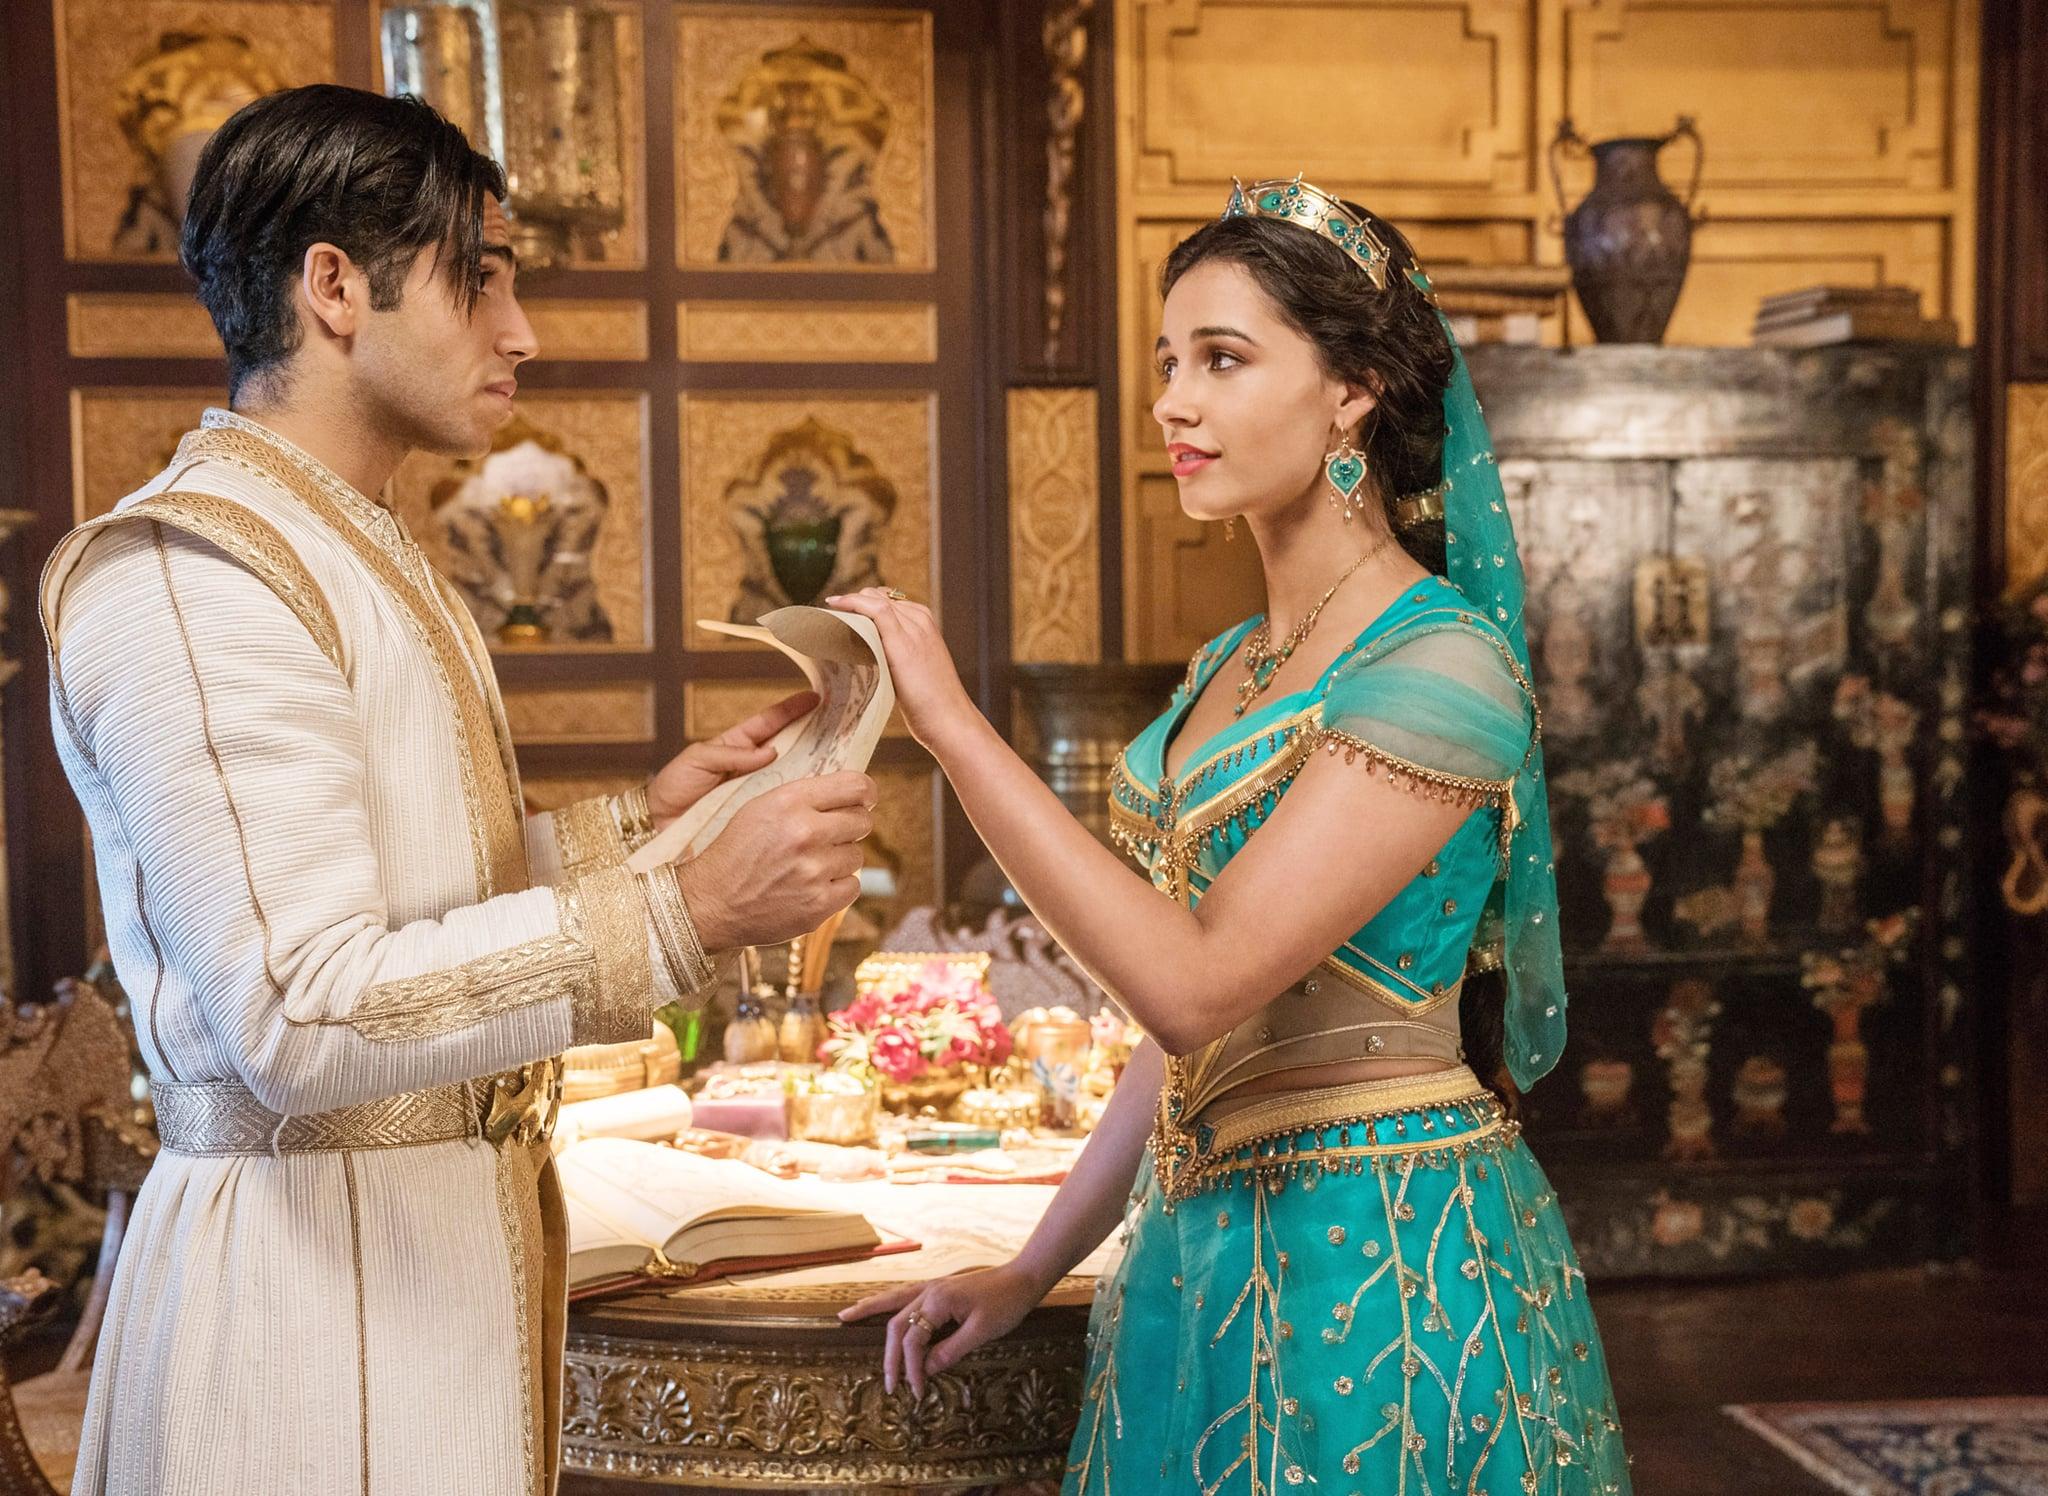 Hairstylist Interview For The Aladdin Live Action Movie Popsugar